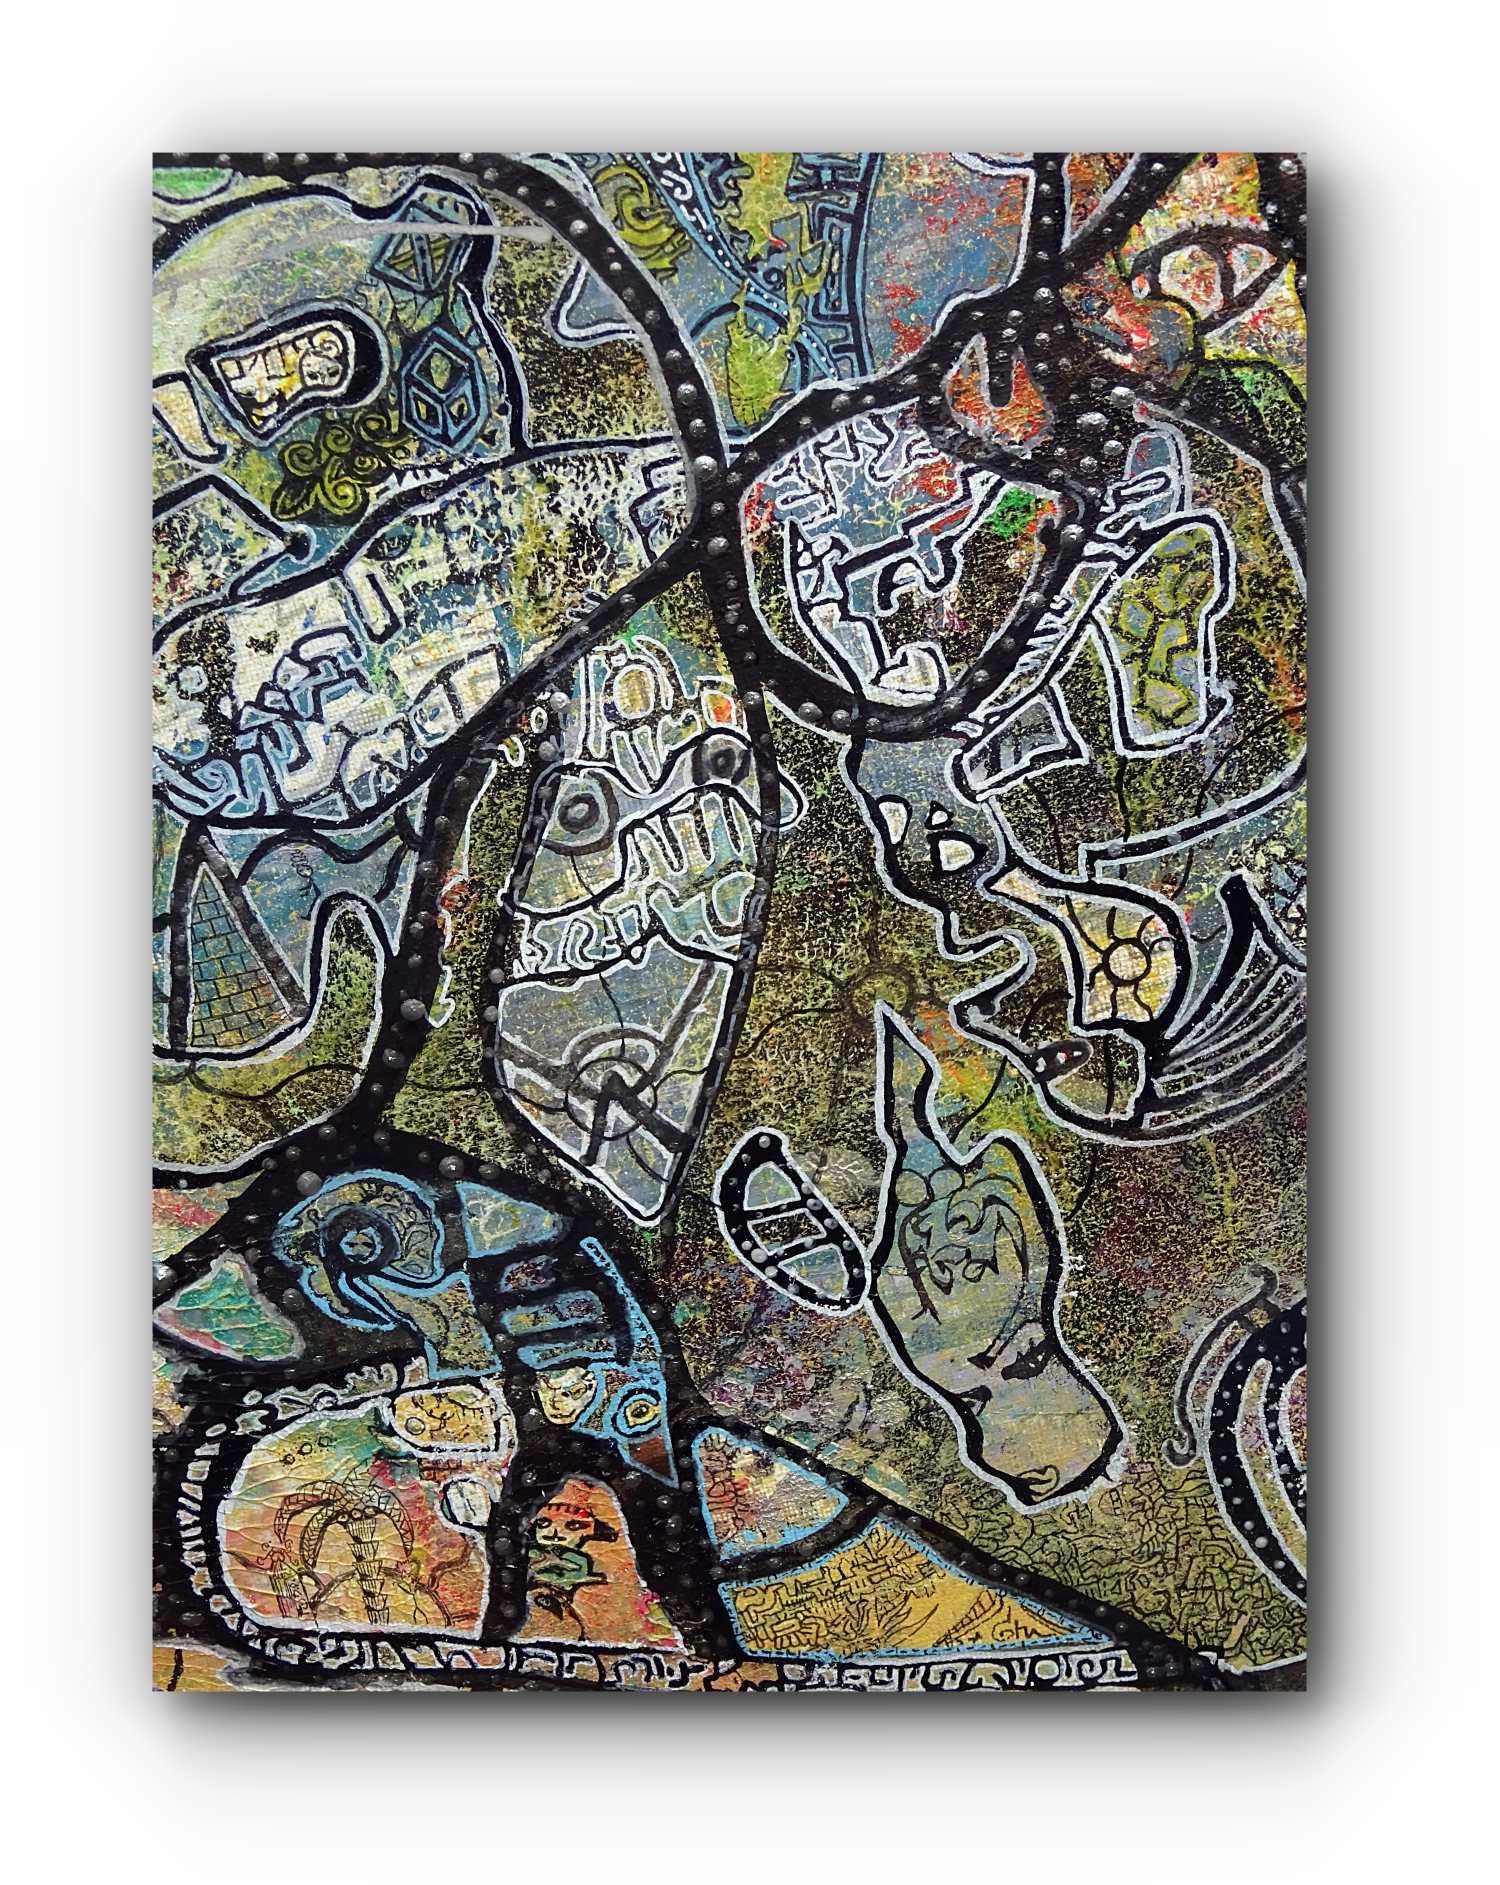 painting-detail-9-desert-dwellers-artists-ingress-vortices.jpg